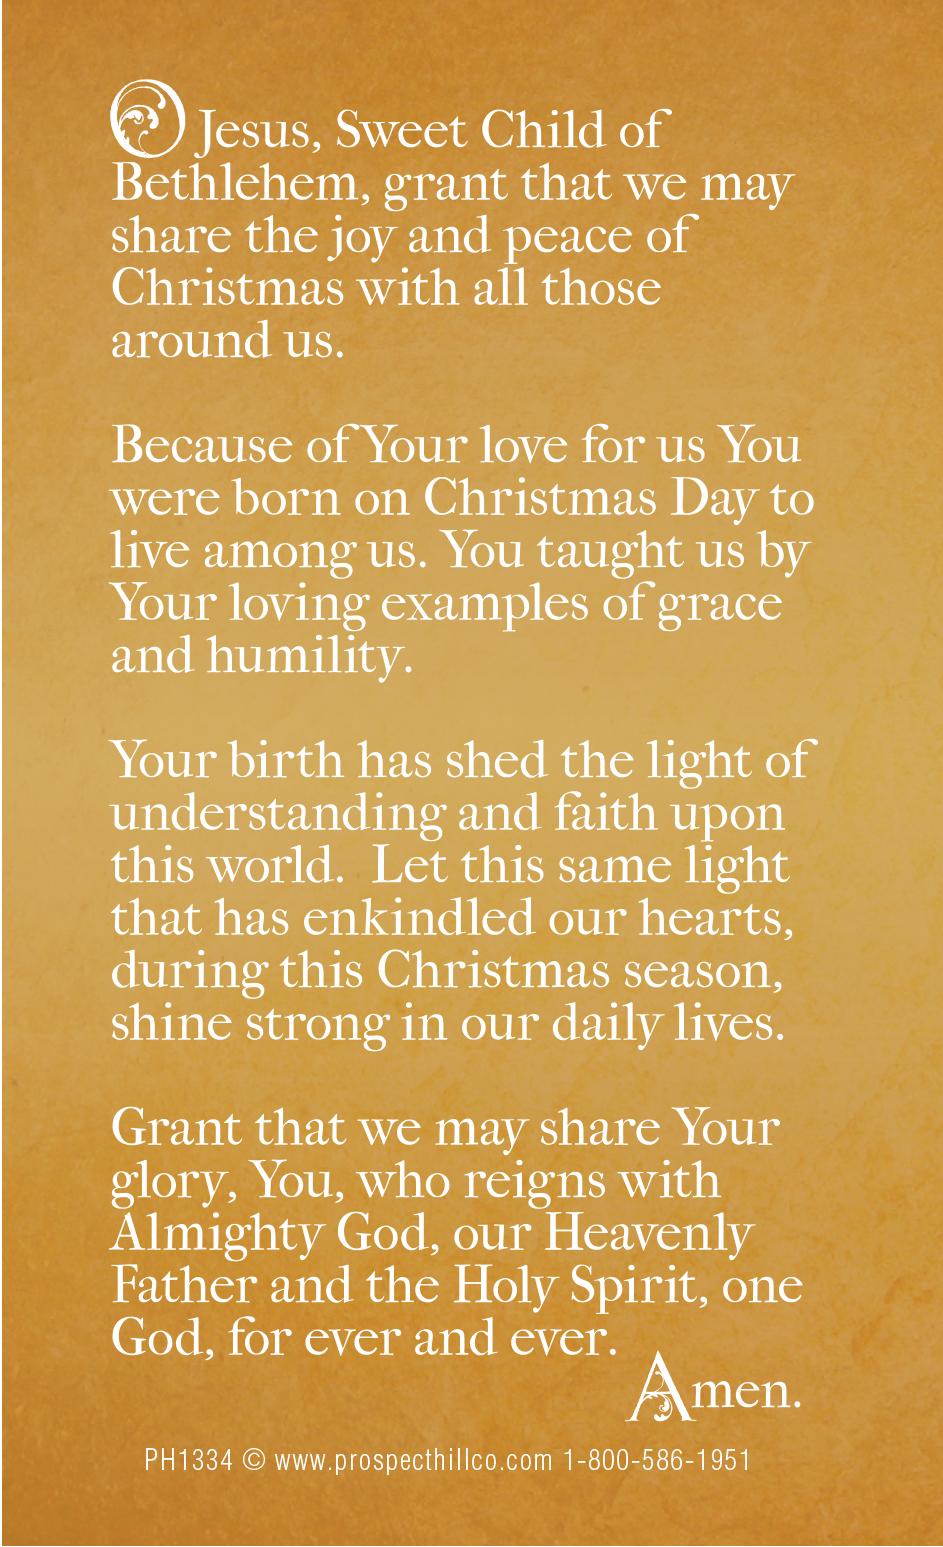 Christmas-Prayer-Card-2013-Back-FINAL – Prospect Hill Company